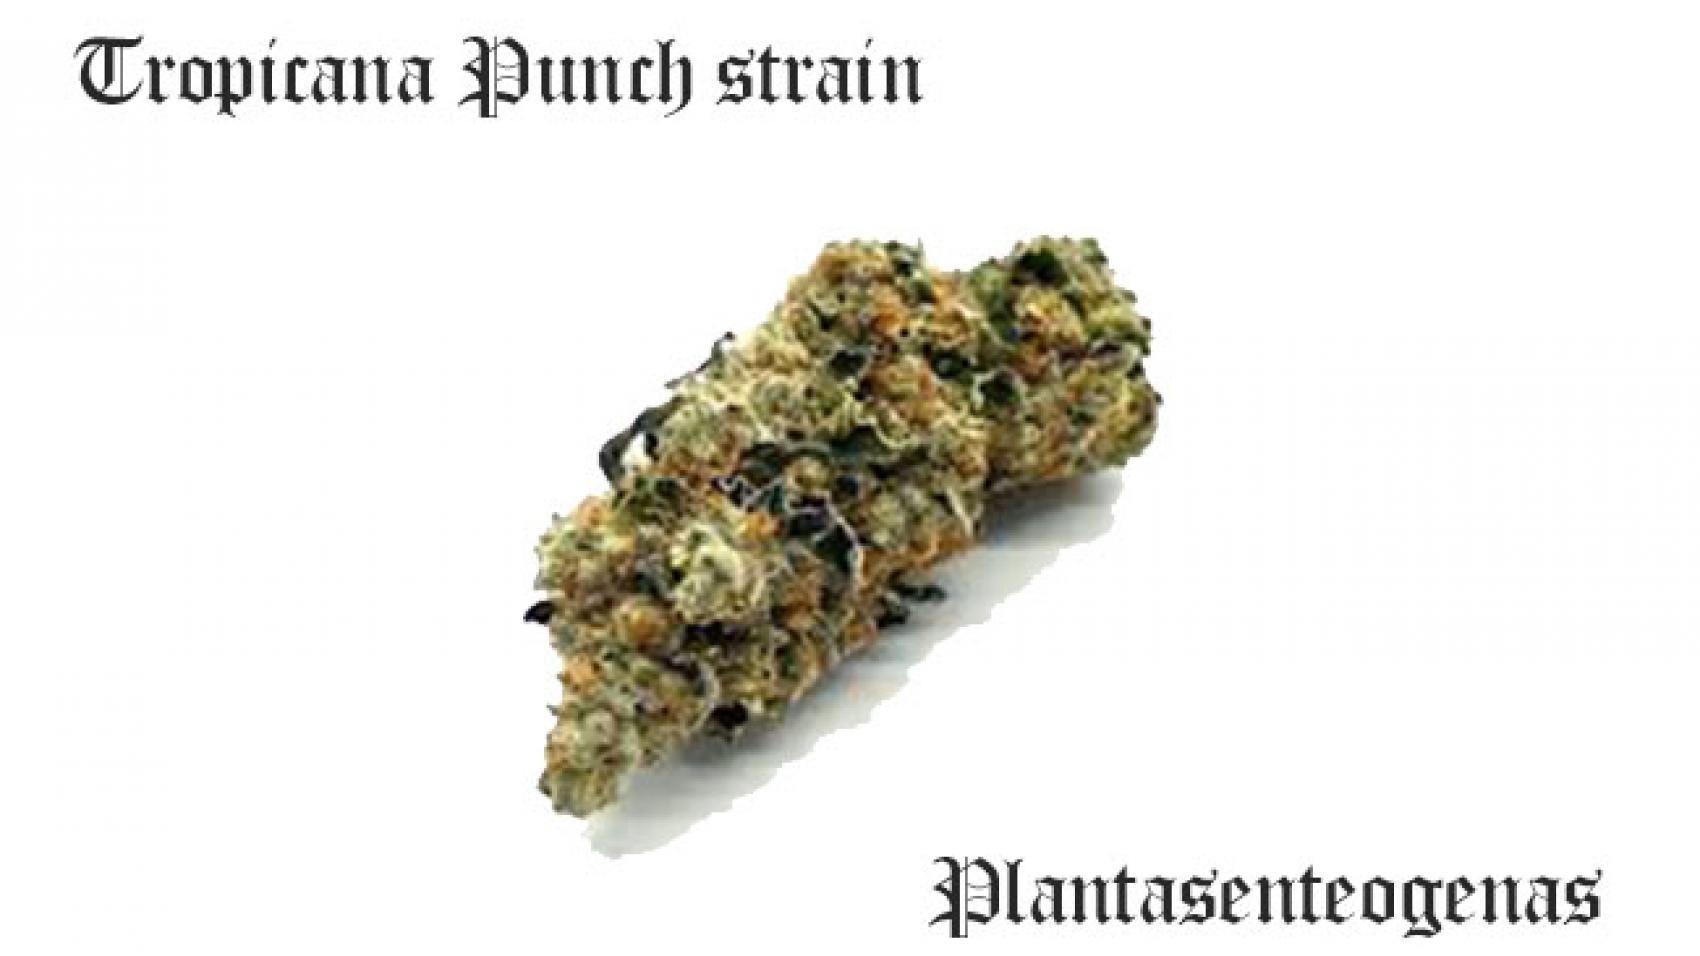 Tropicana Punch strain